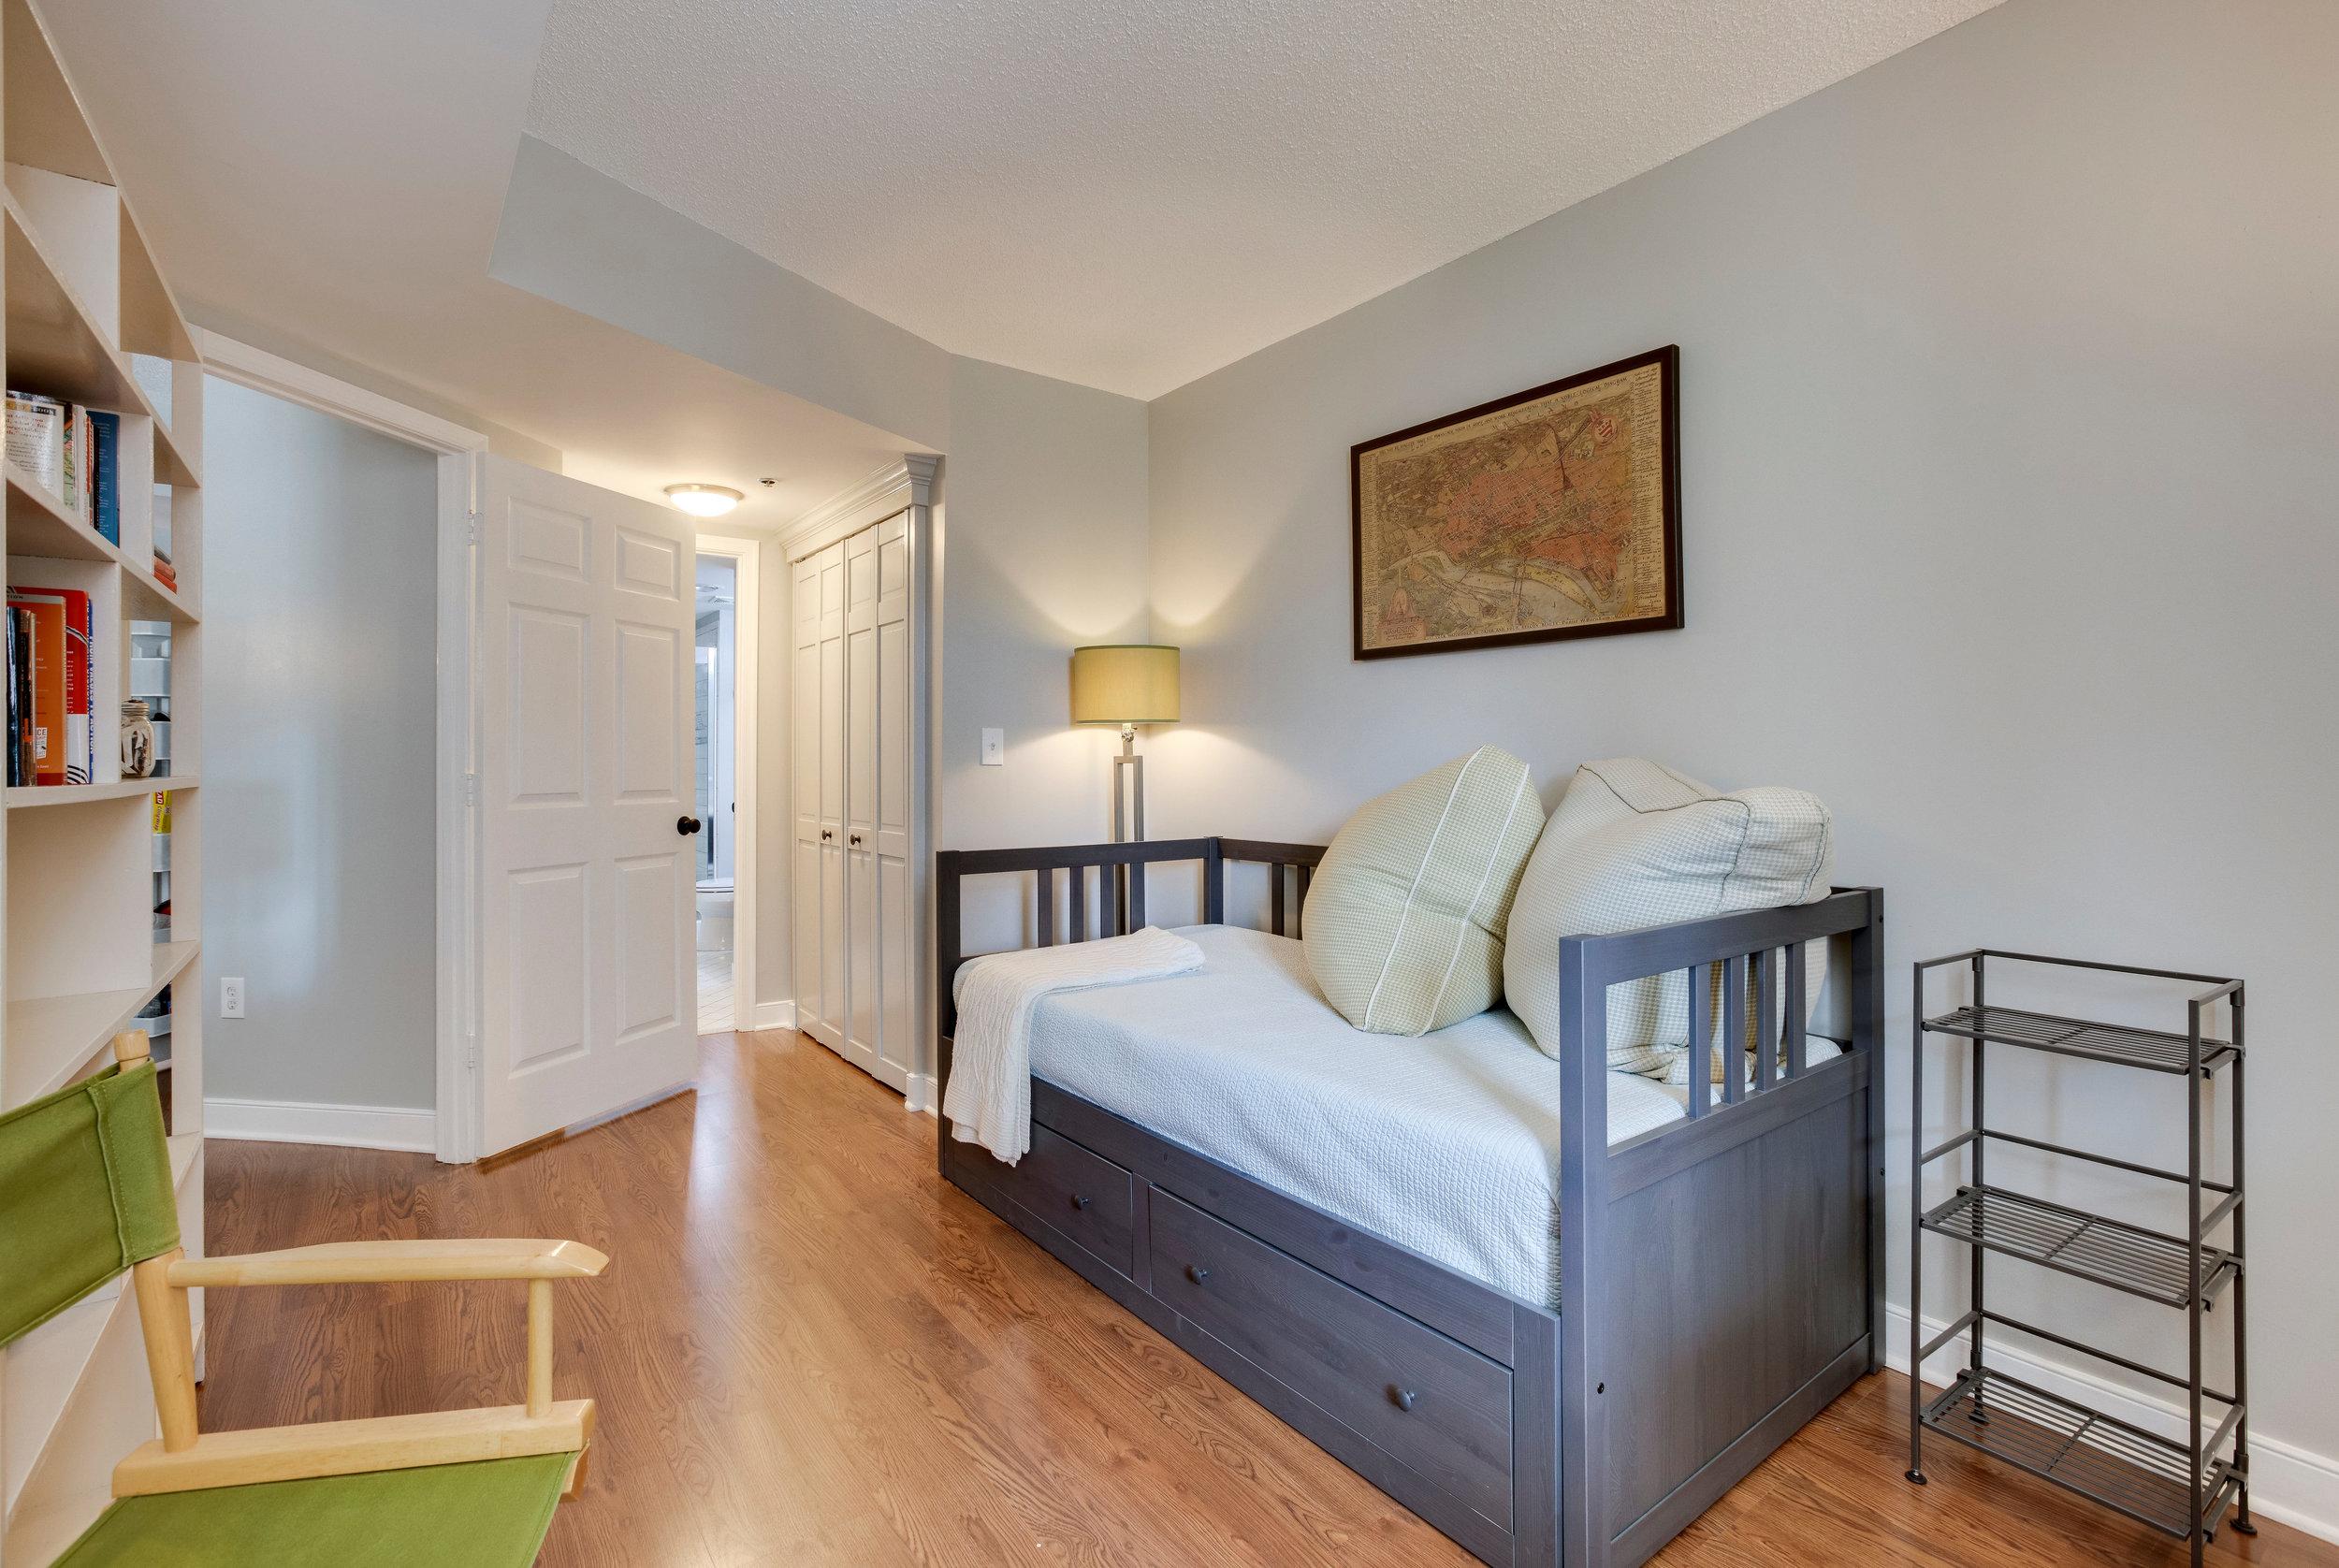 1050 N Taylor St 608 Arlington-print-039-39-Bedroom-4200x2816-300dpi.jpg